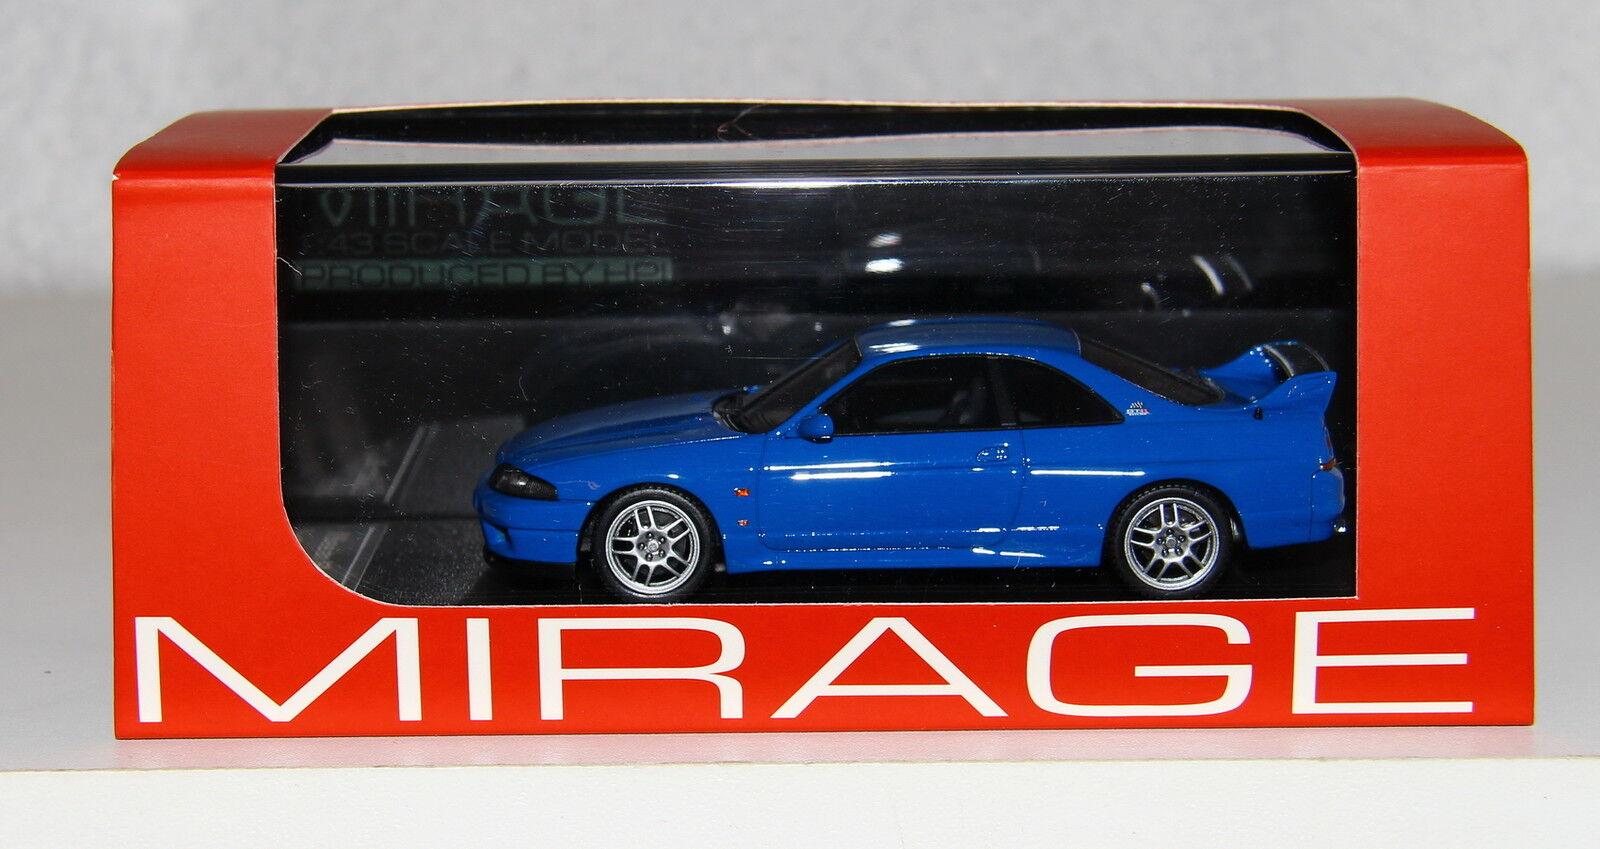 clásico atemporal HPI RESIN 8385 8385 8385 1 43 Nissan R33 Skyline GT-R V-spec LM Limited azul RARE  soporte minorista mayorista